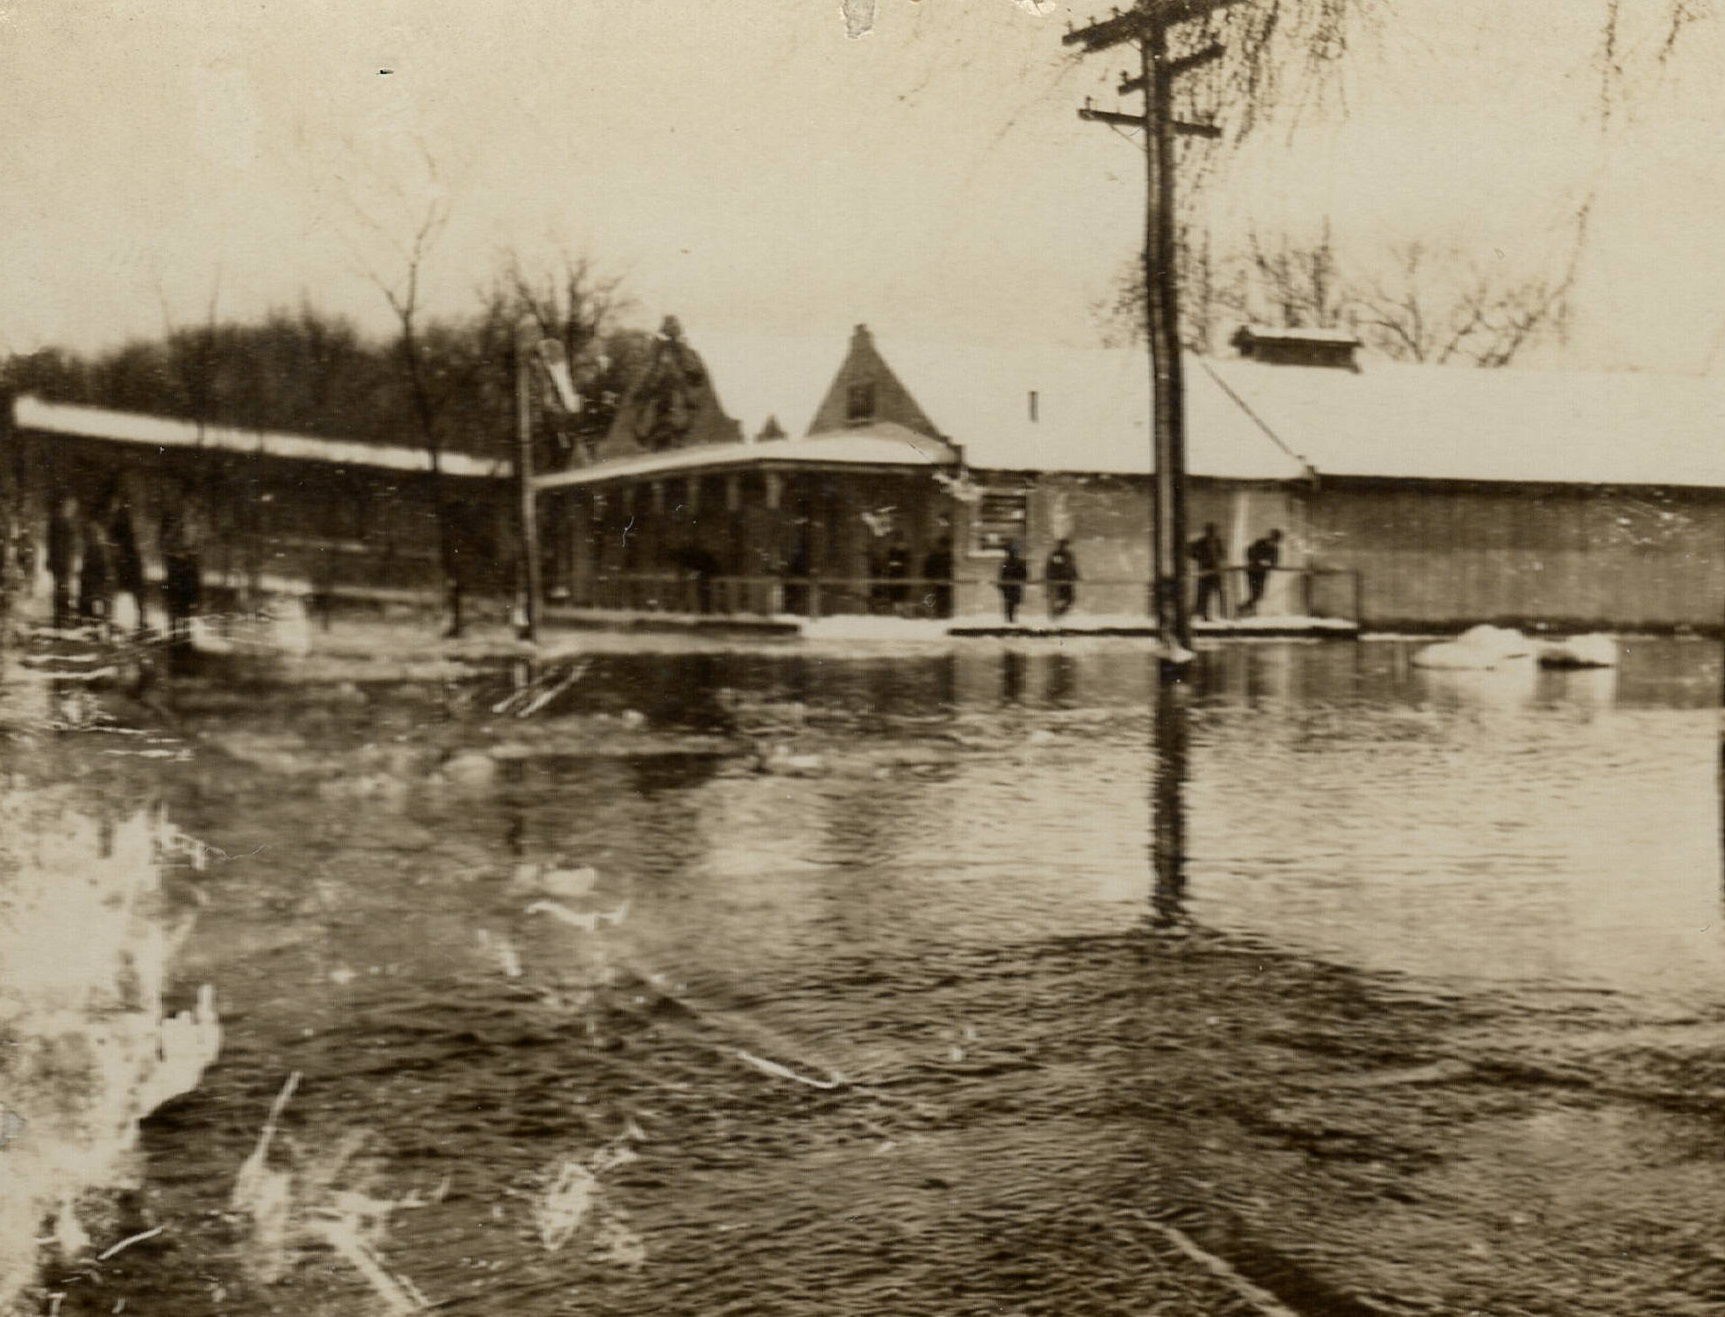 Charles River flood damage at Riverside Ballroom